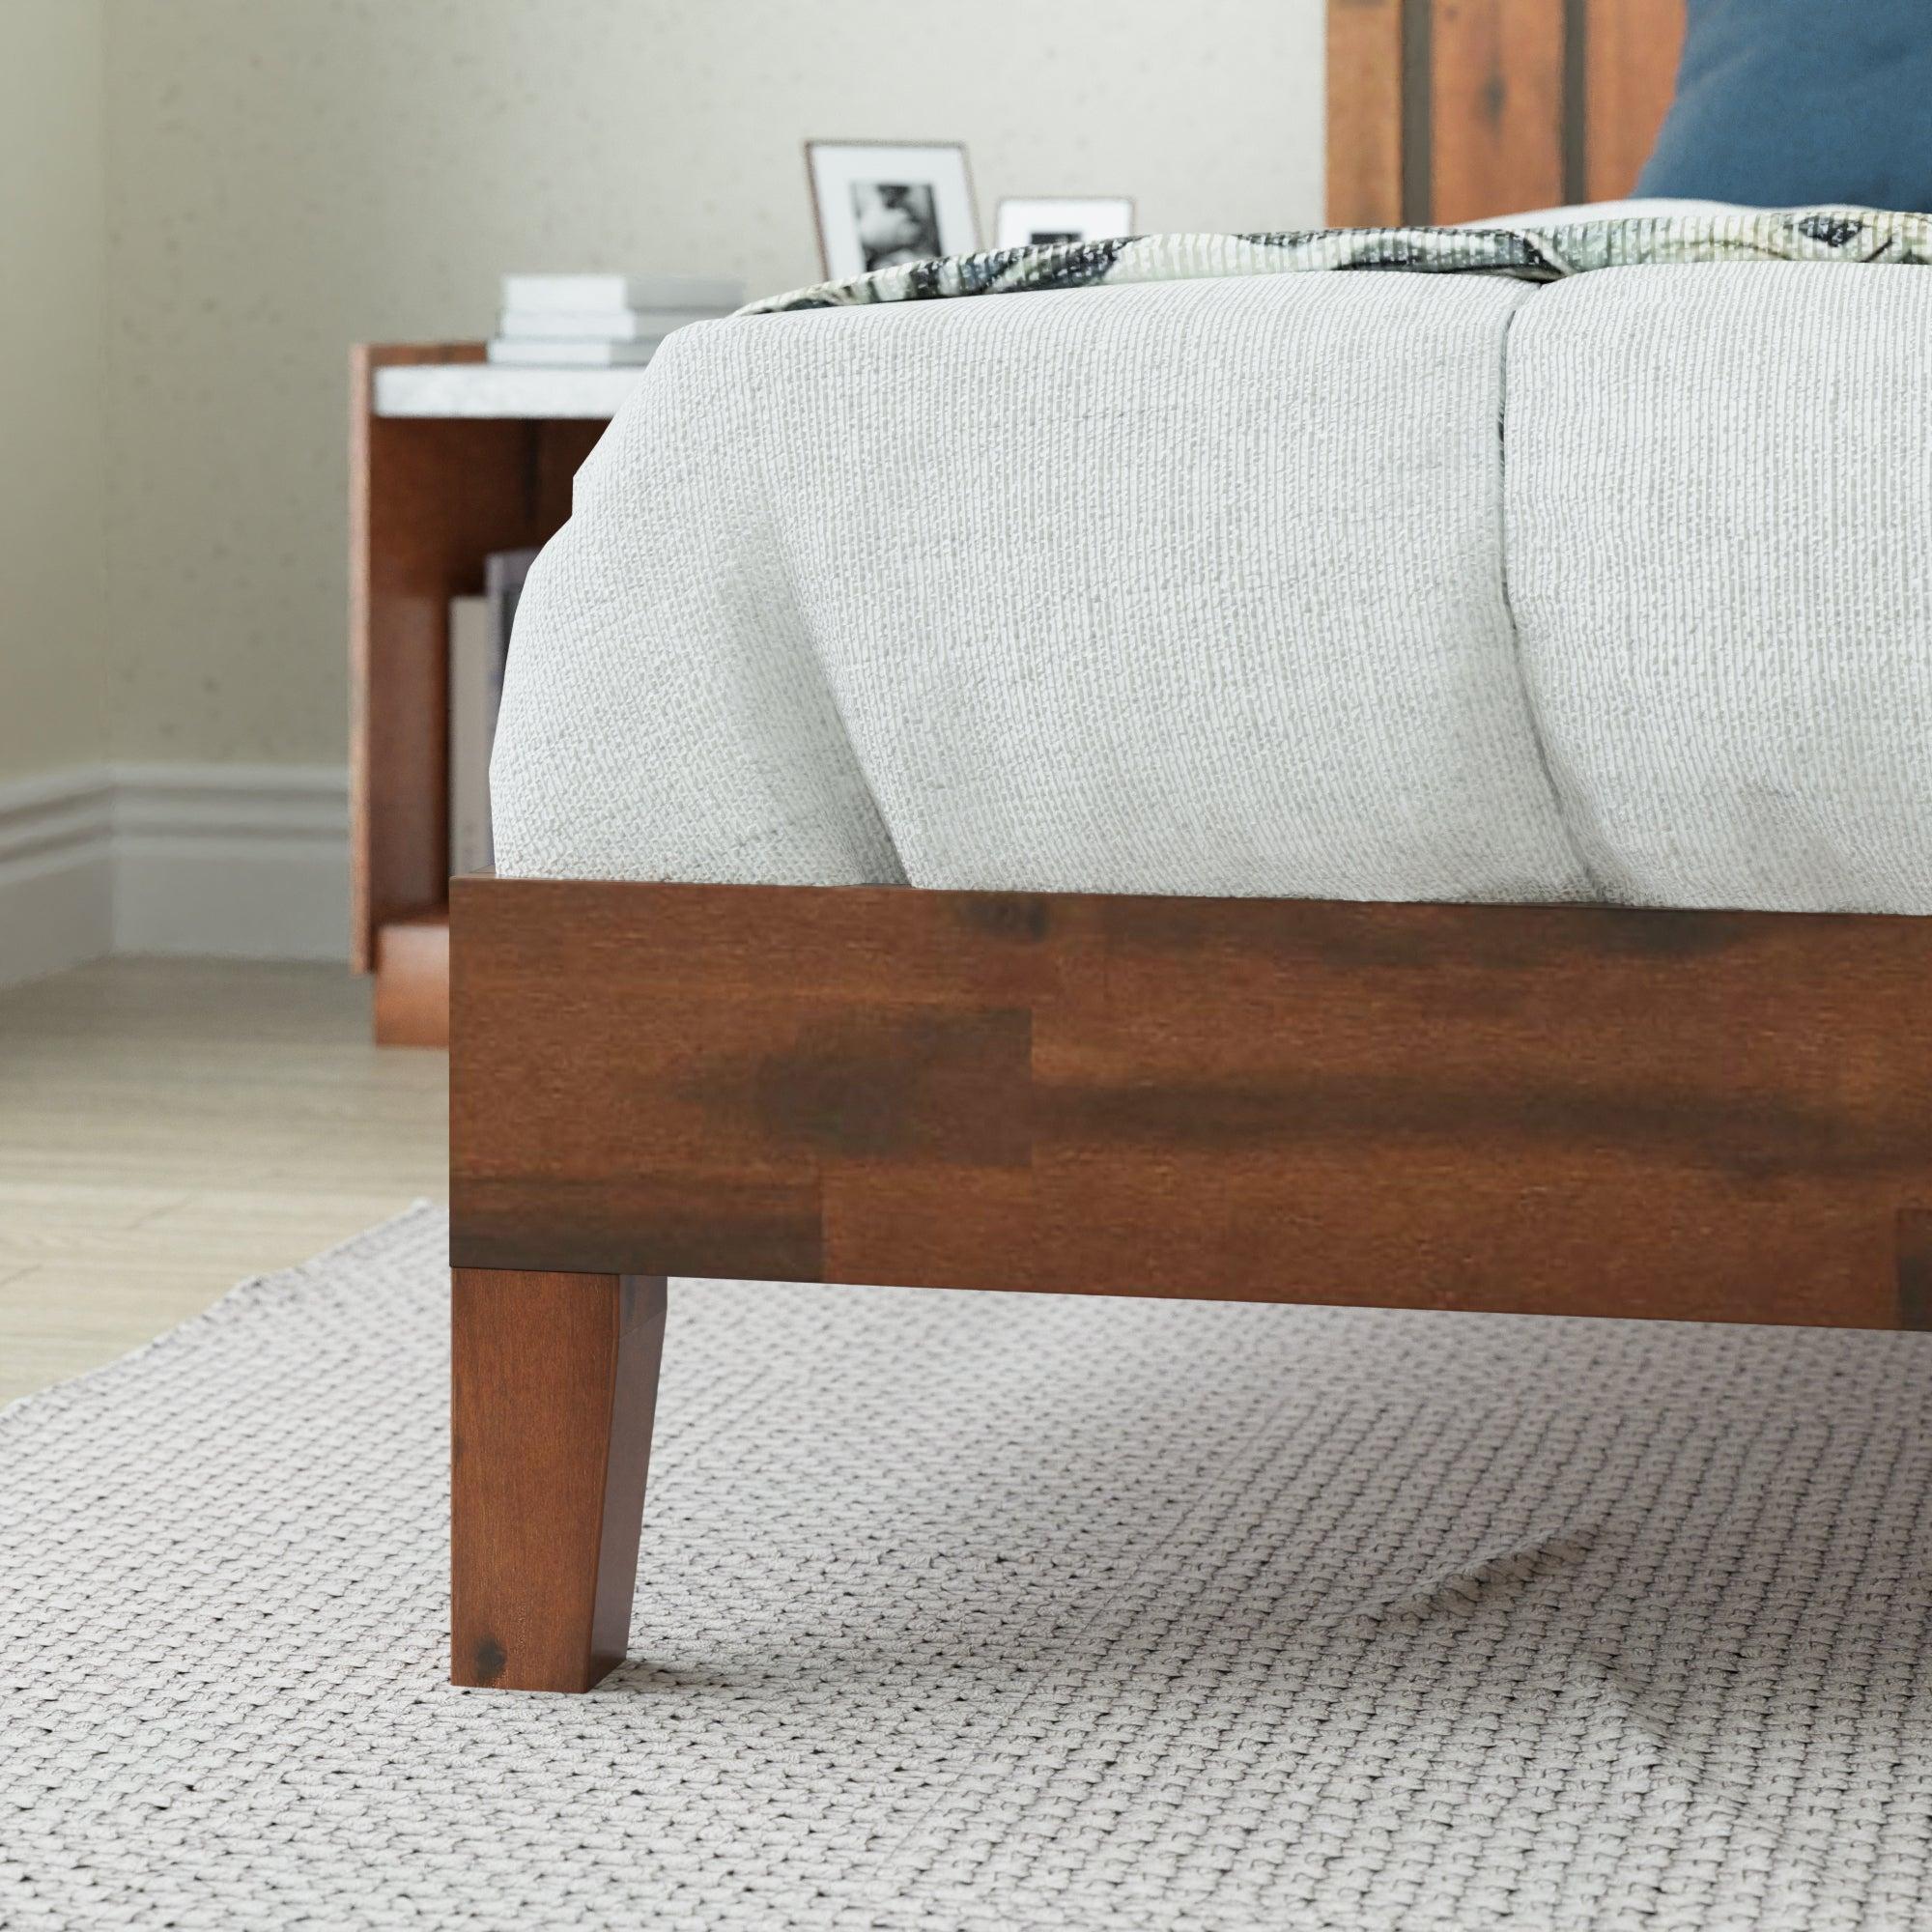 Zinus Deluxe Solid Wood Platform Bed Frame Timber